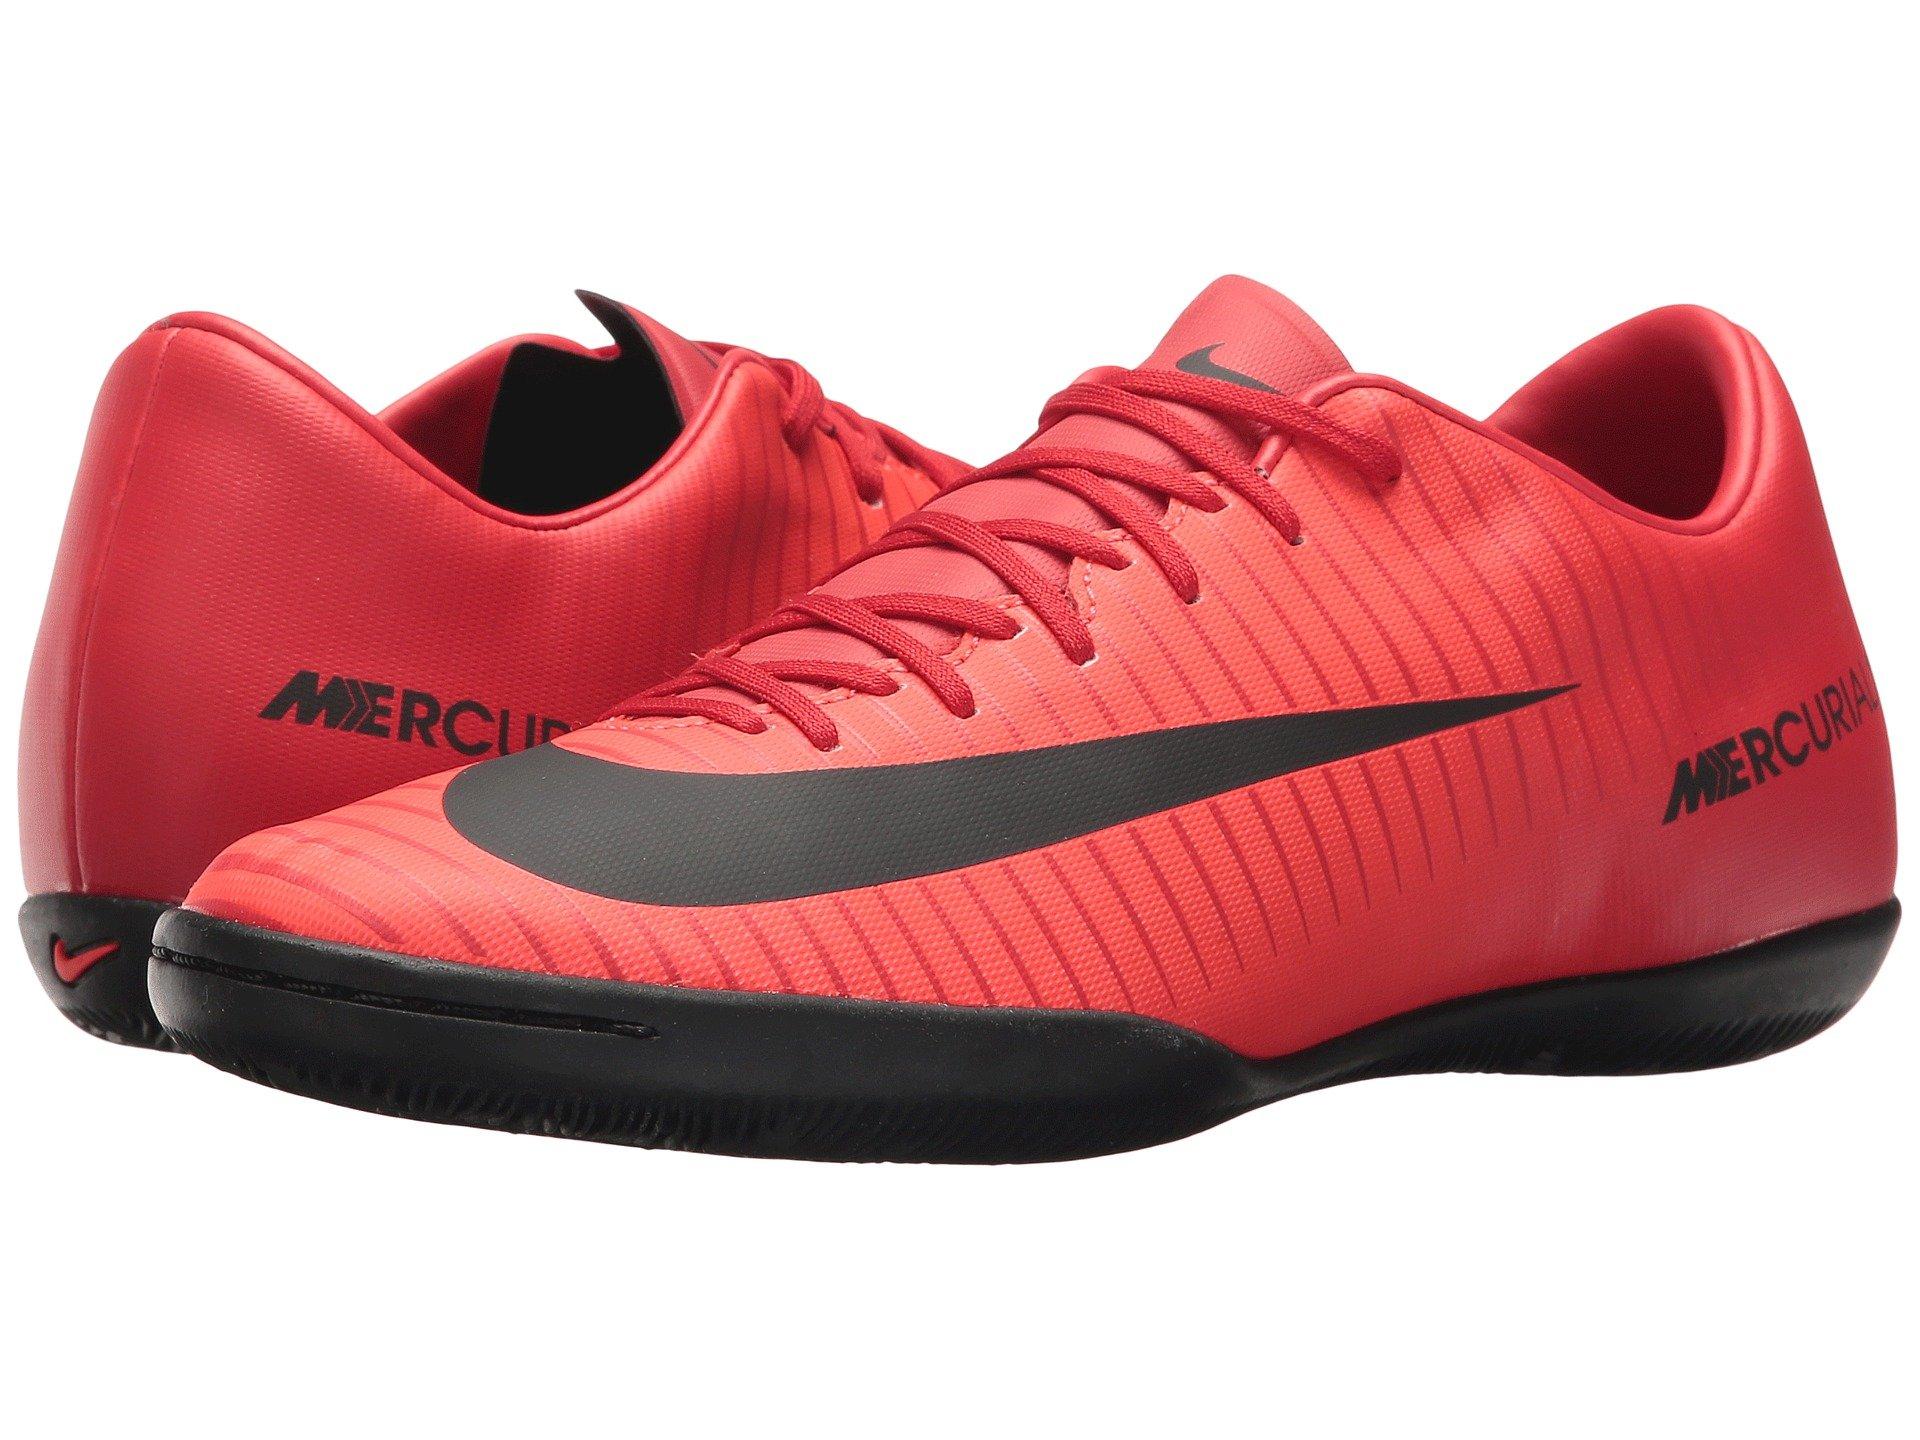 54080aca26a4 Nike Mercurial Victory Vi Ic In University Red Black Bright Crimson ...